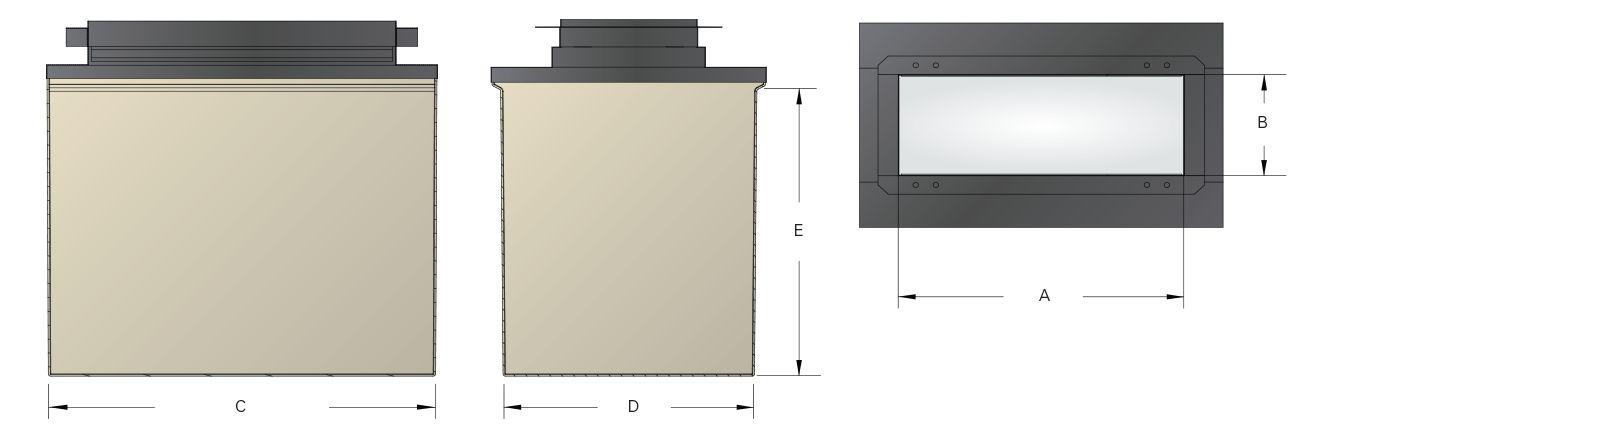 Large Mouth Fiberglass 4800 Dispenser Sumps - Dims.psd